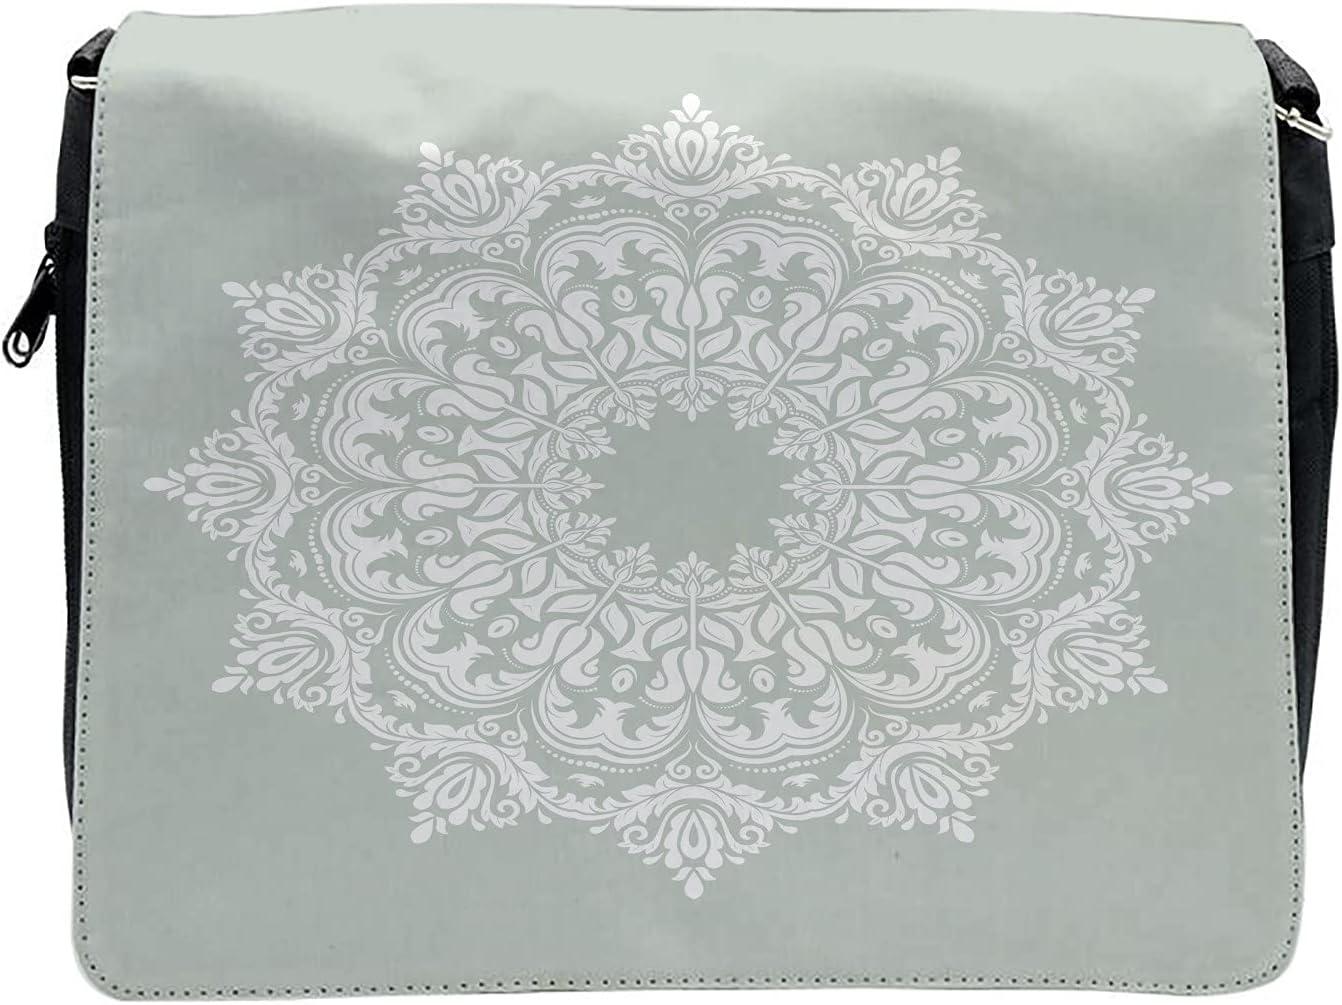 Ambesonne Orient Cross Body Messenger Bag, Damask Floral Motifs, Unisex